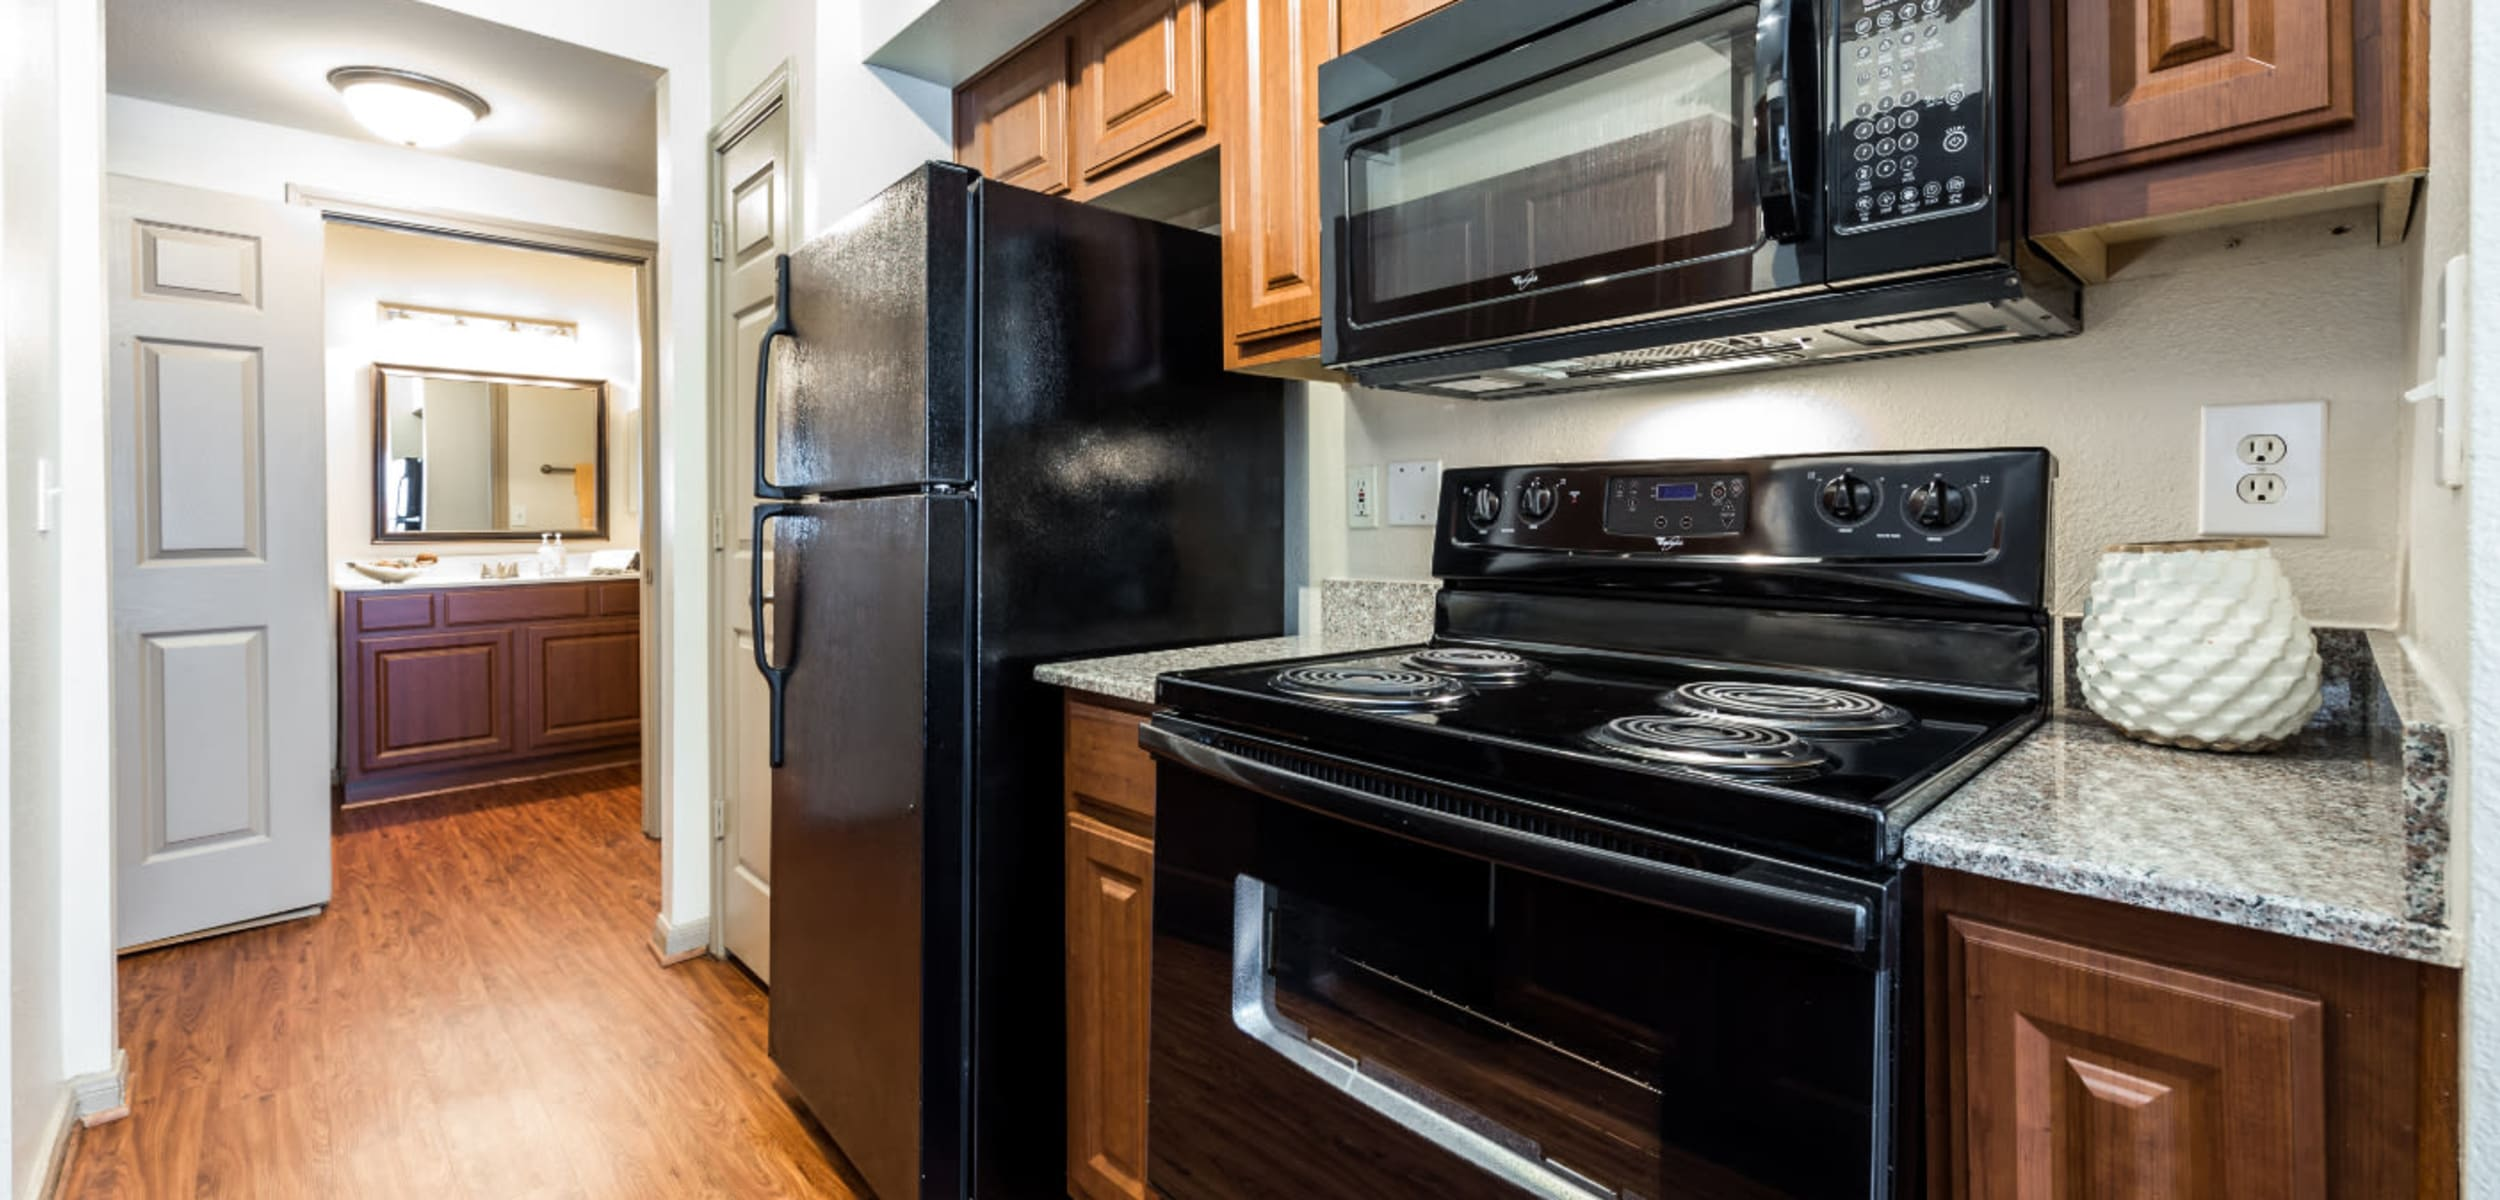 Pass through area of kitchen towards bathroom at Marquis on Park Row in Houston, Texas